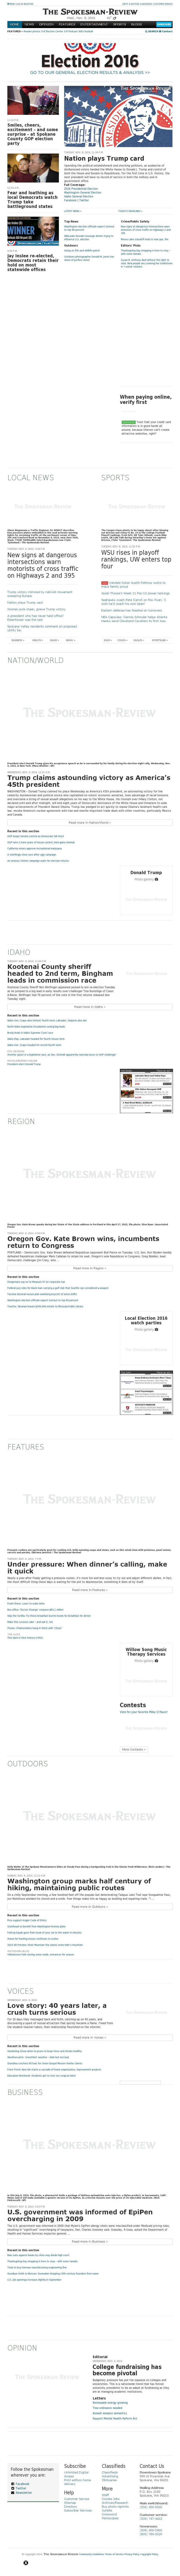 The (Spokane) Spokesman-Review at Wednesday Nov. 9, 2016, 12:21 p.m. UTC